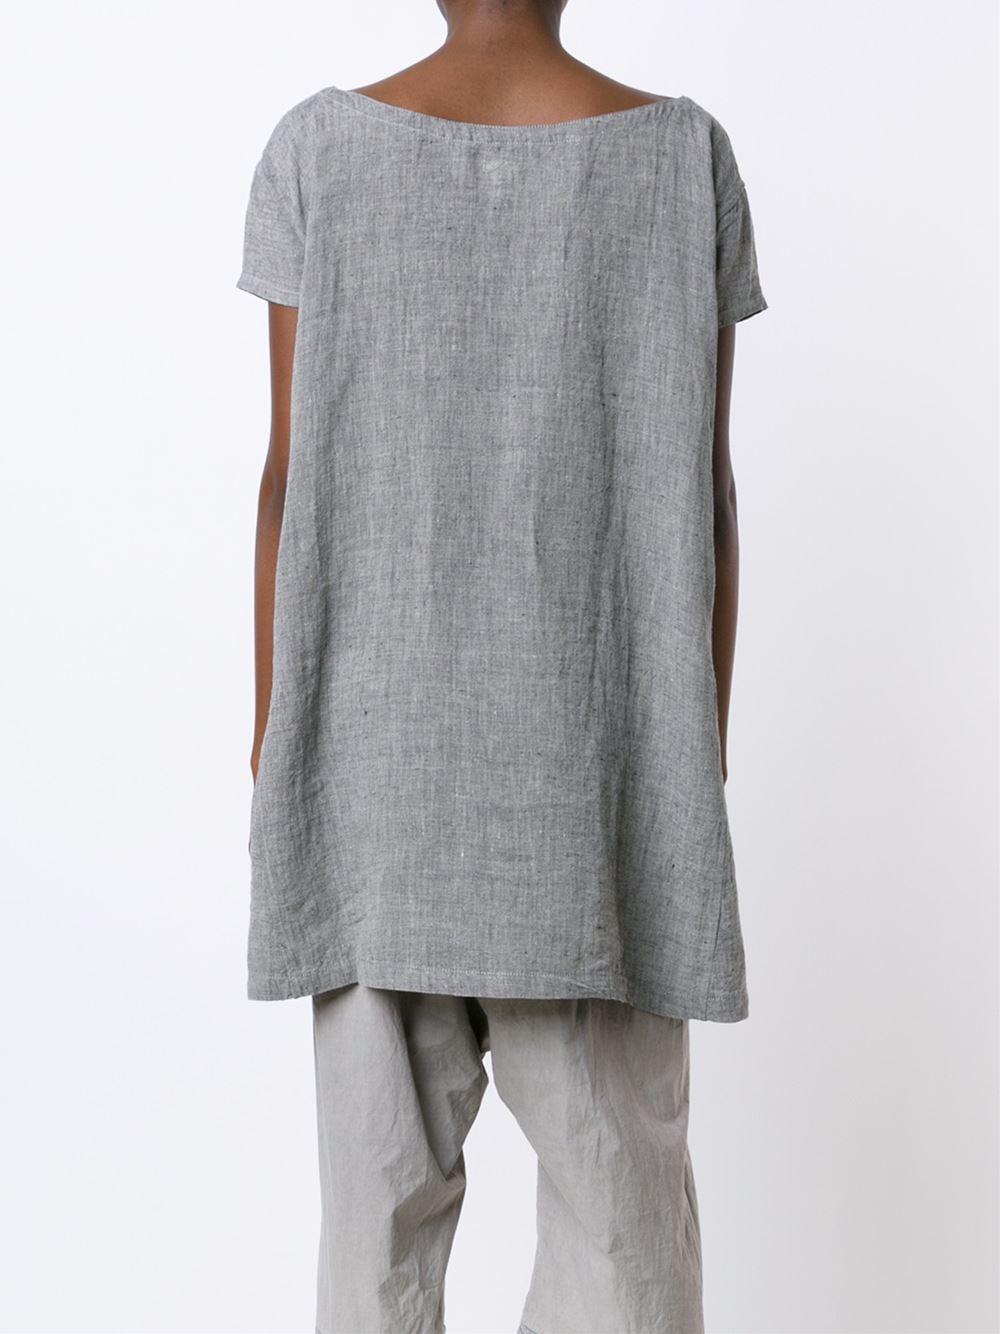 Dosa Women S Clothing